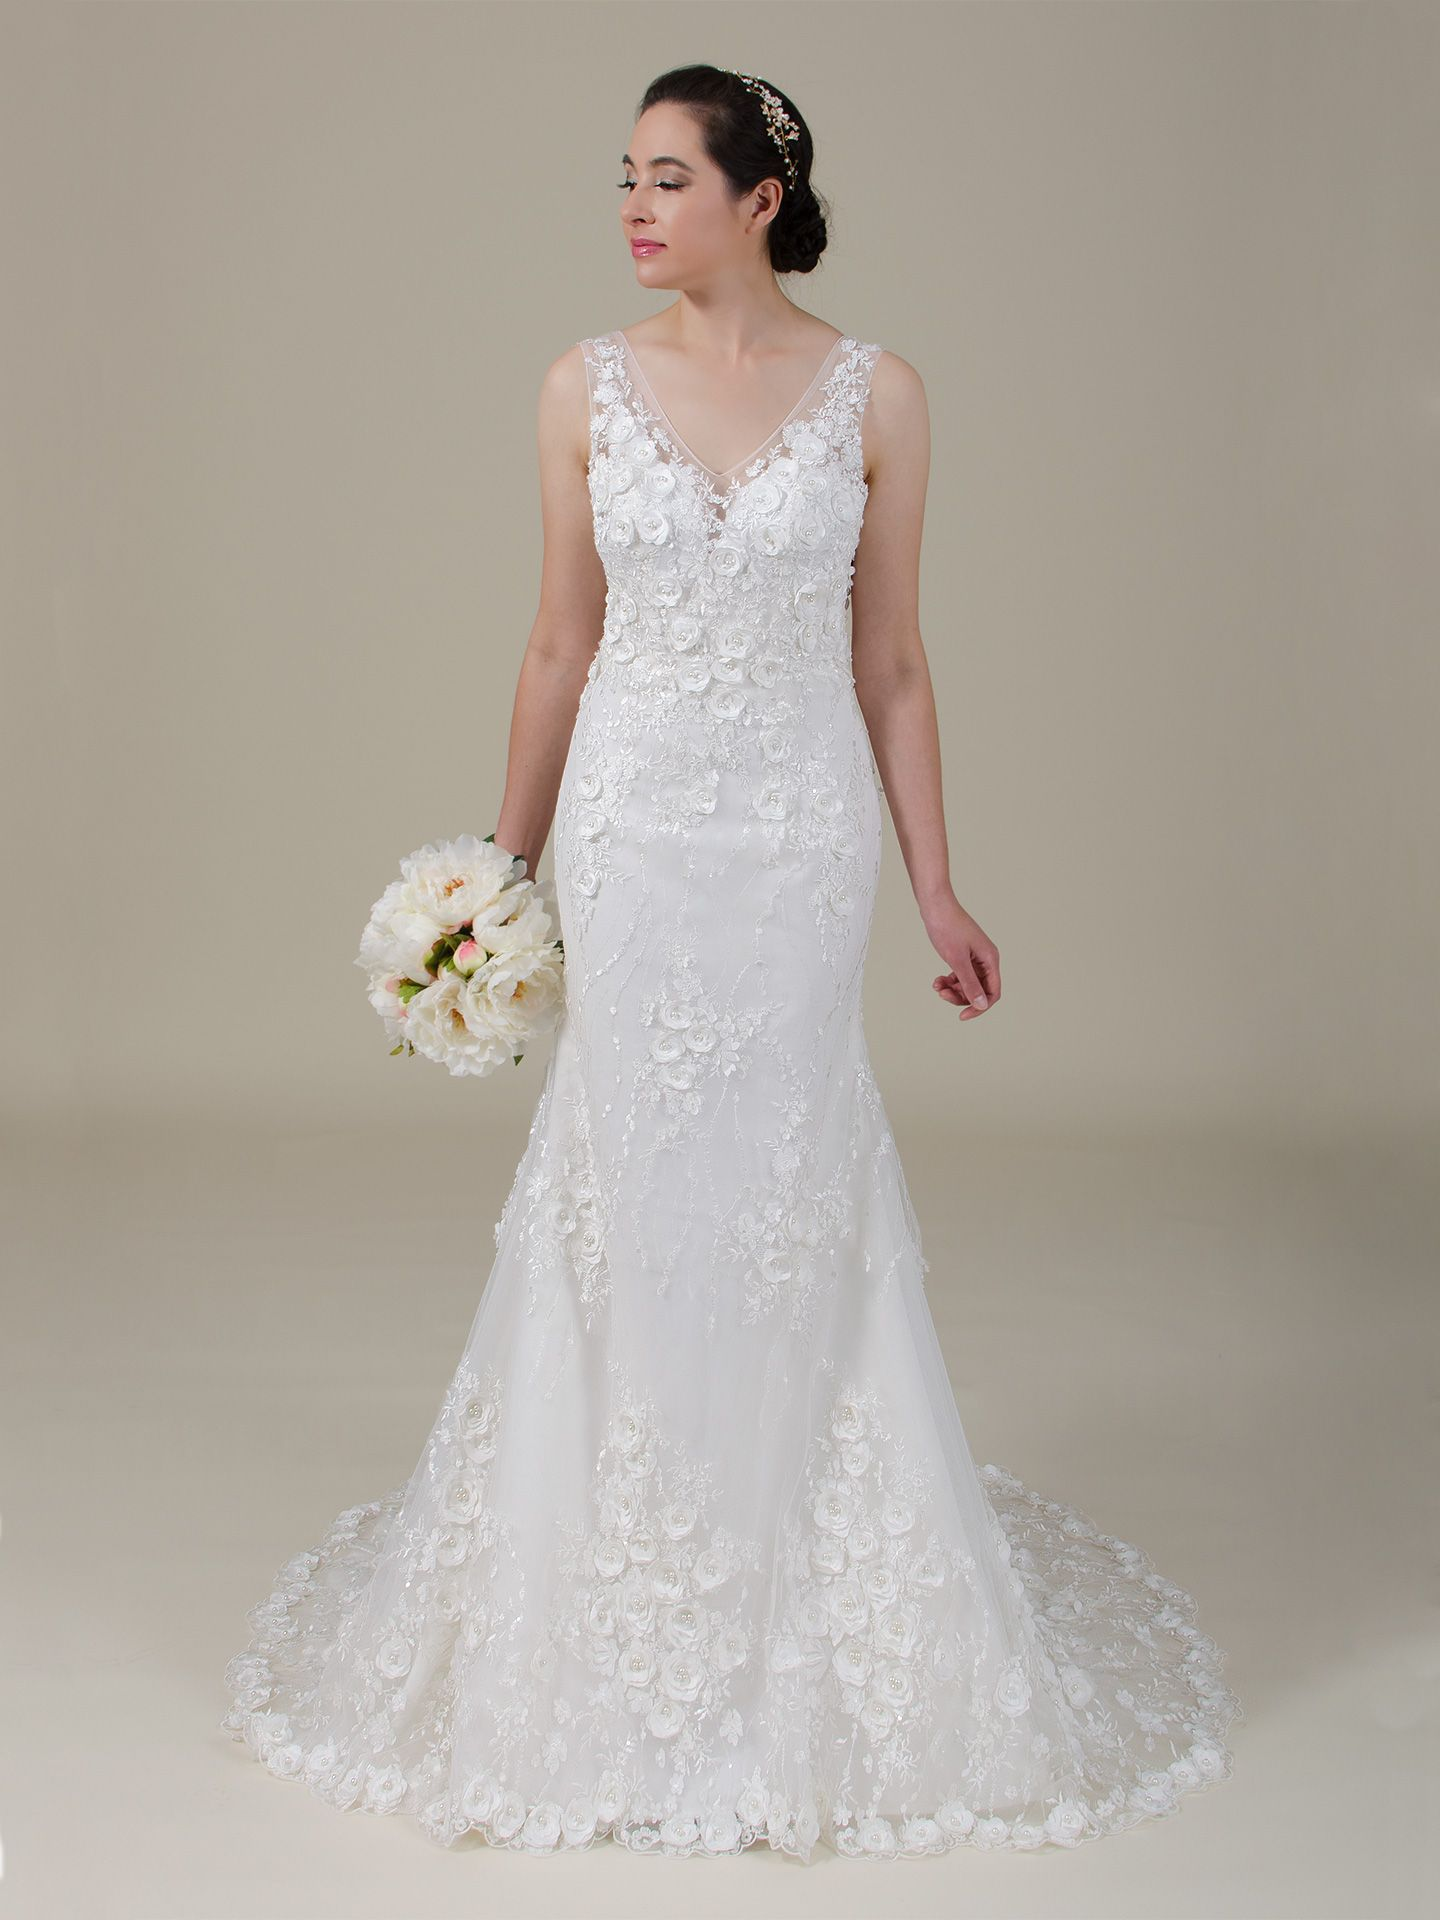 3d Flowers Lace Wedding Dress 4062 Lace Weddings Lace Wedding